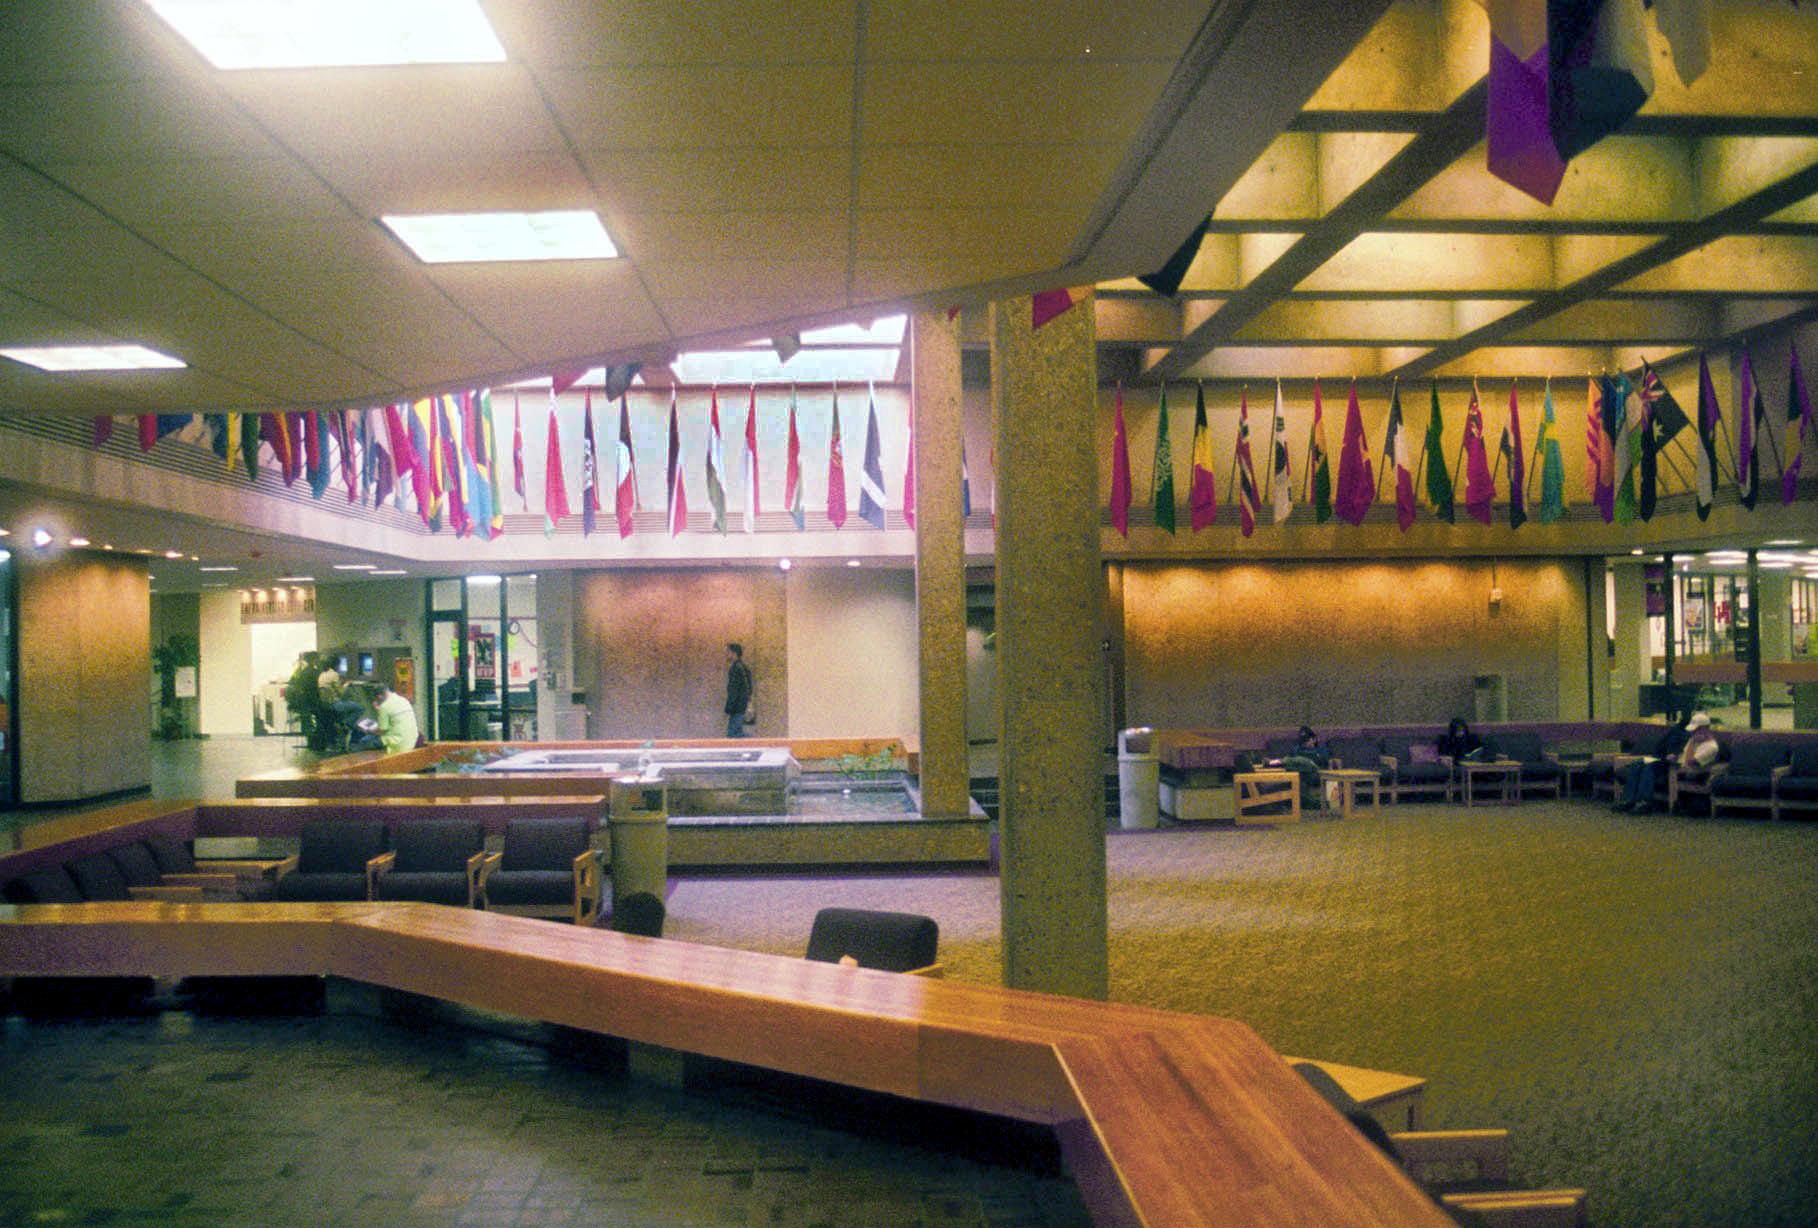 University Center Underground